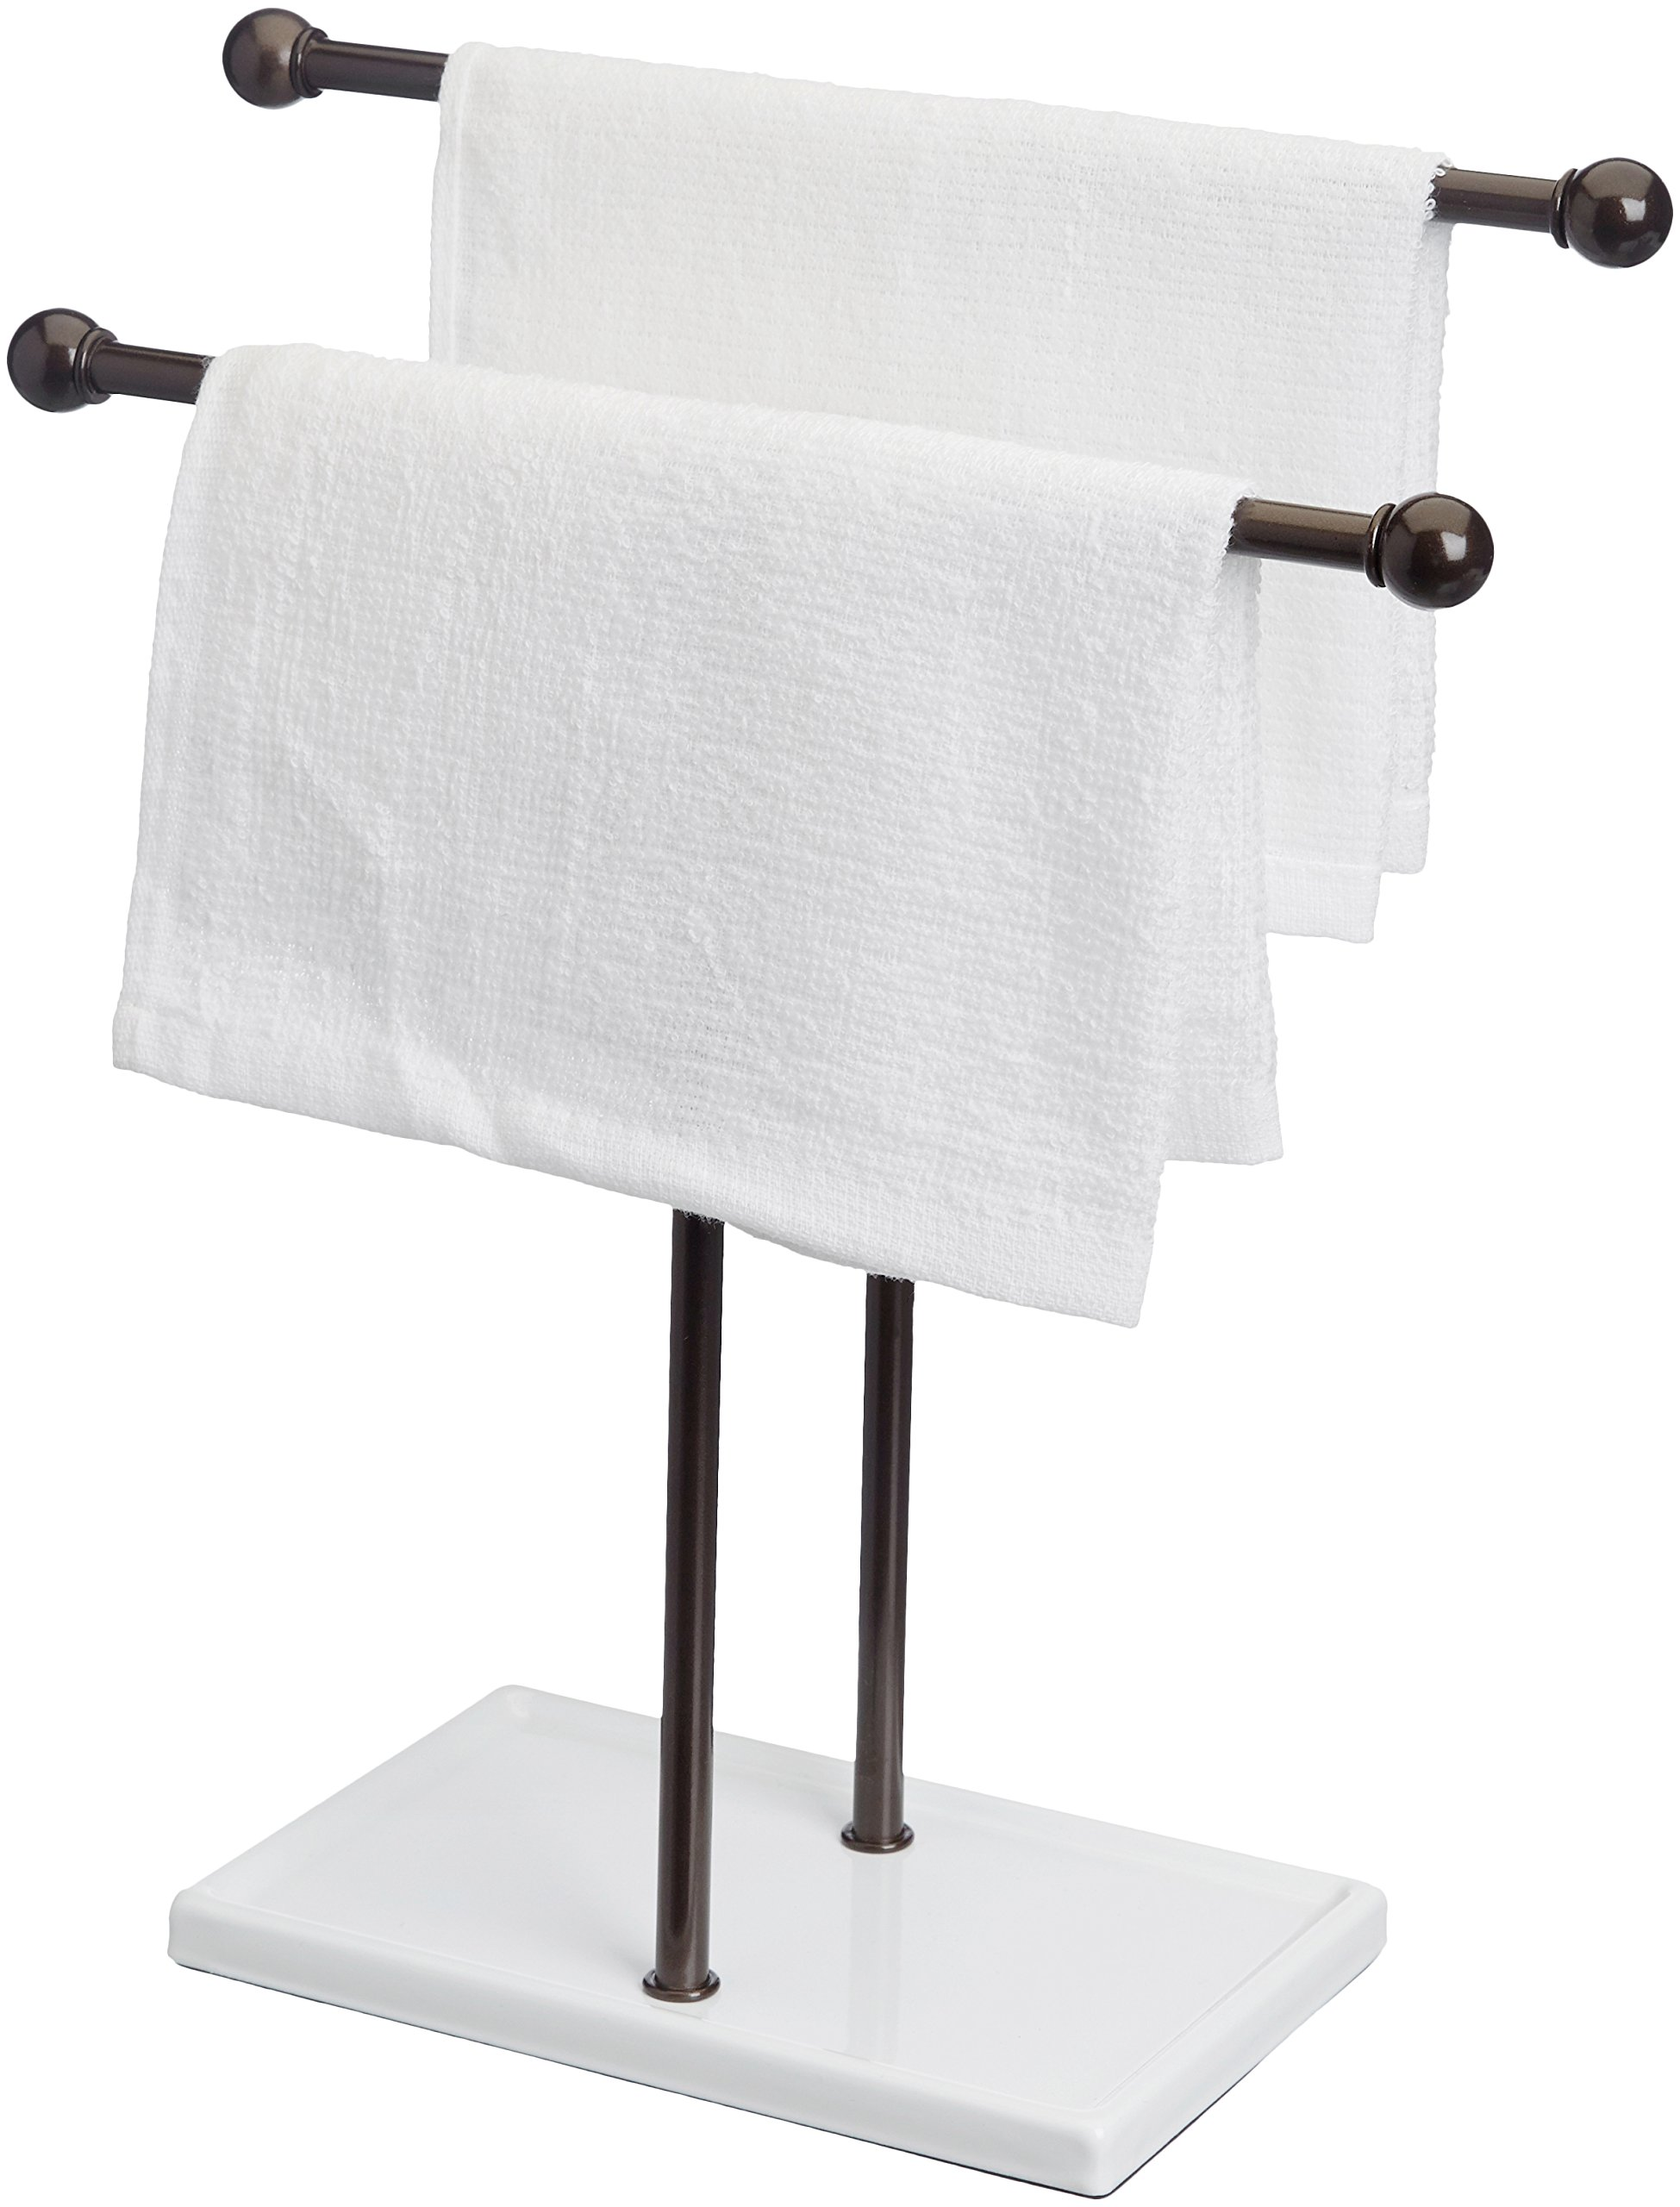 AmazonBasics Double-T Hand Towel Stand - towel